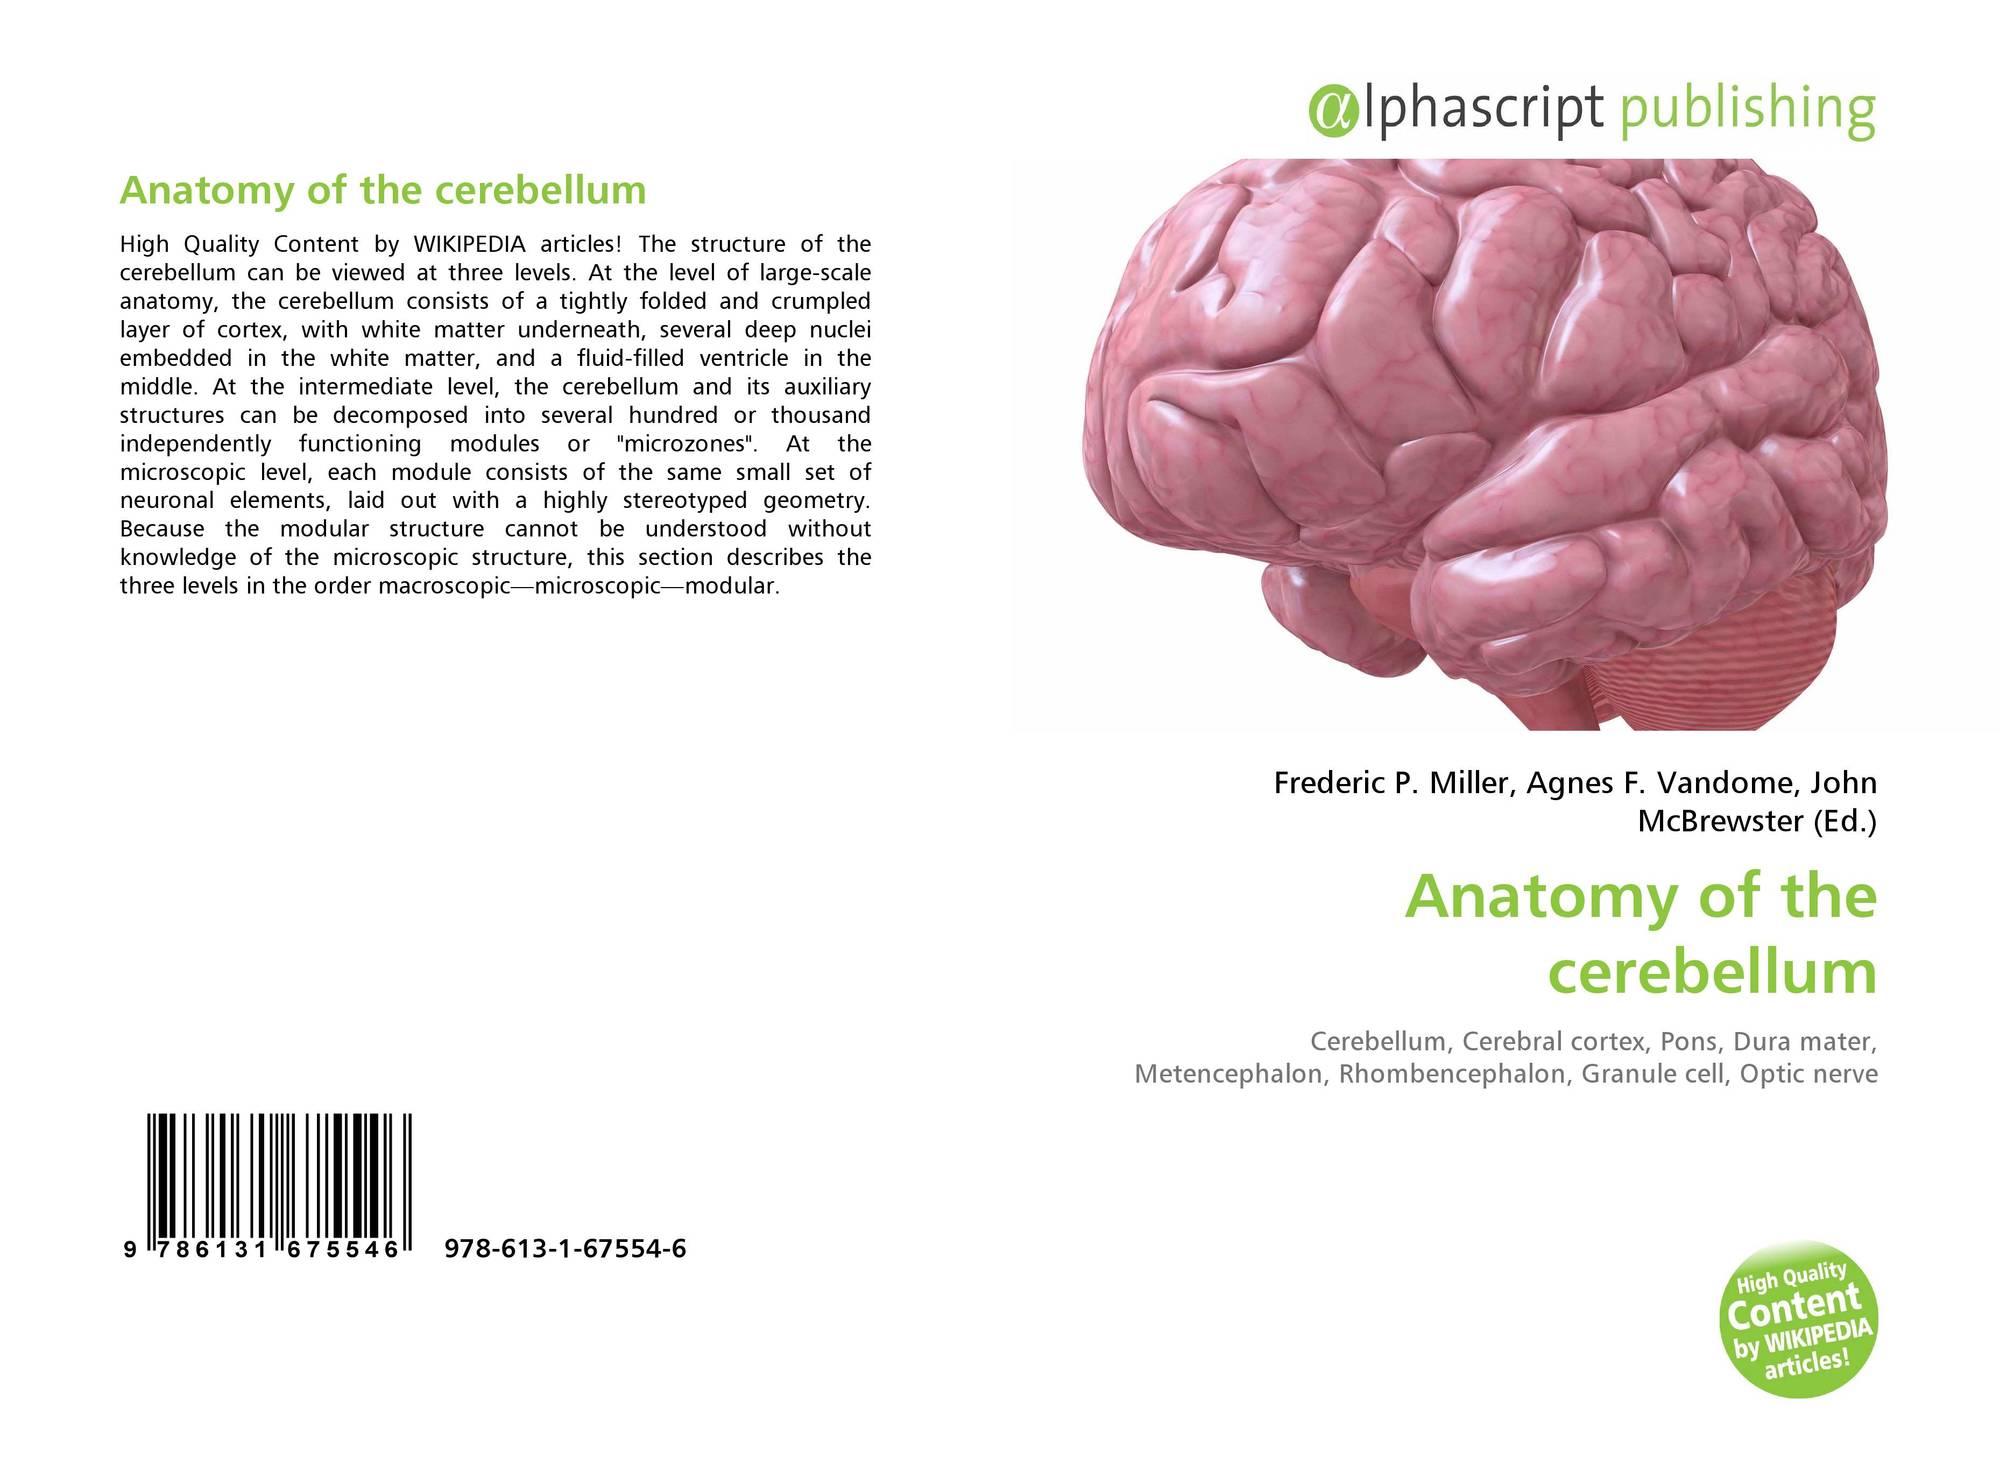 Anatomy of the cerebellum, 978-613-1-67554-6, 6131675546 ,9786131675546